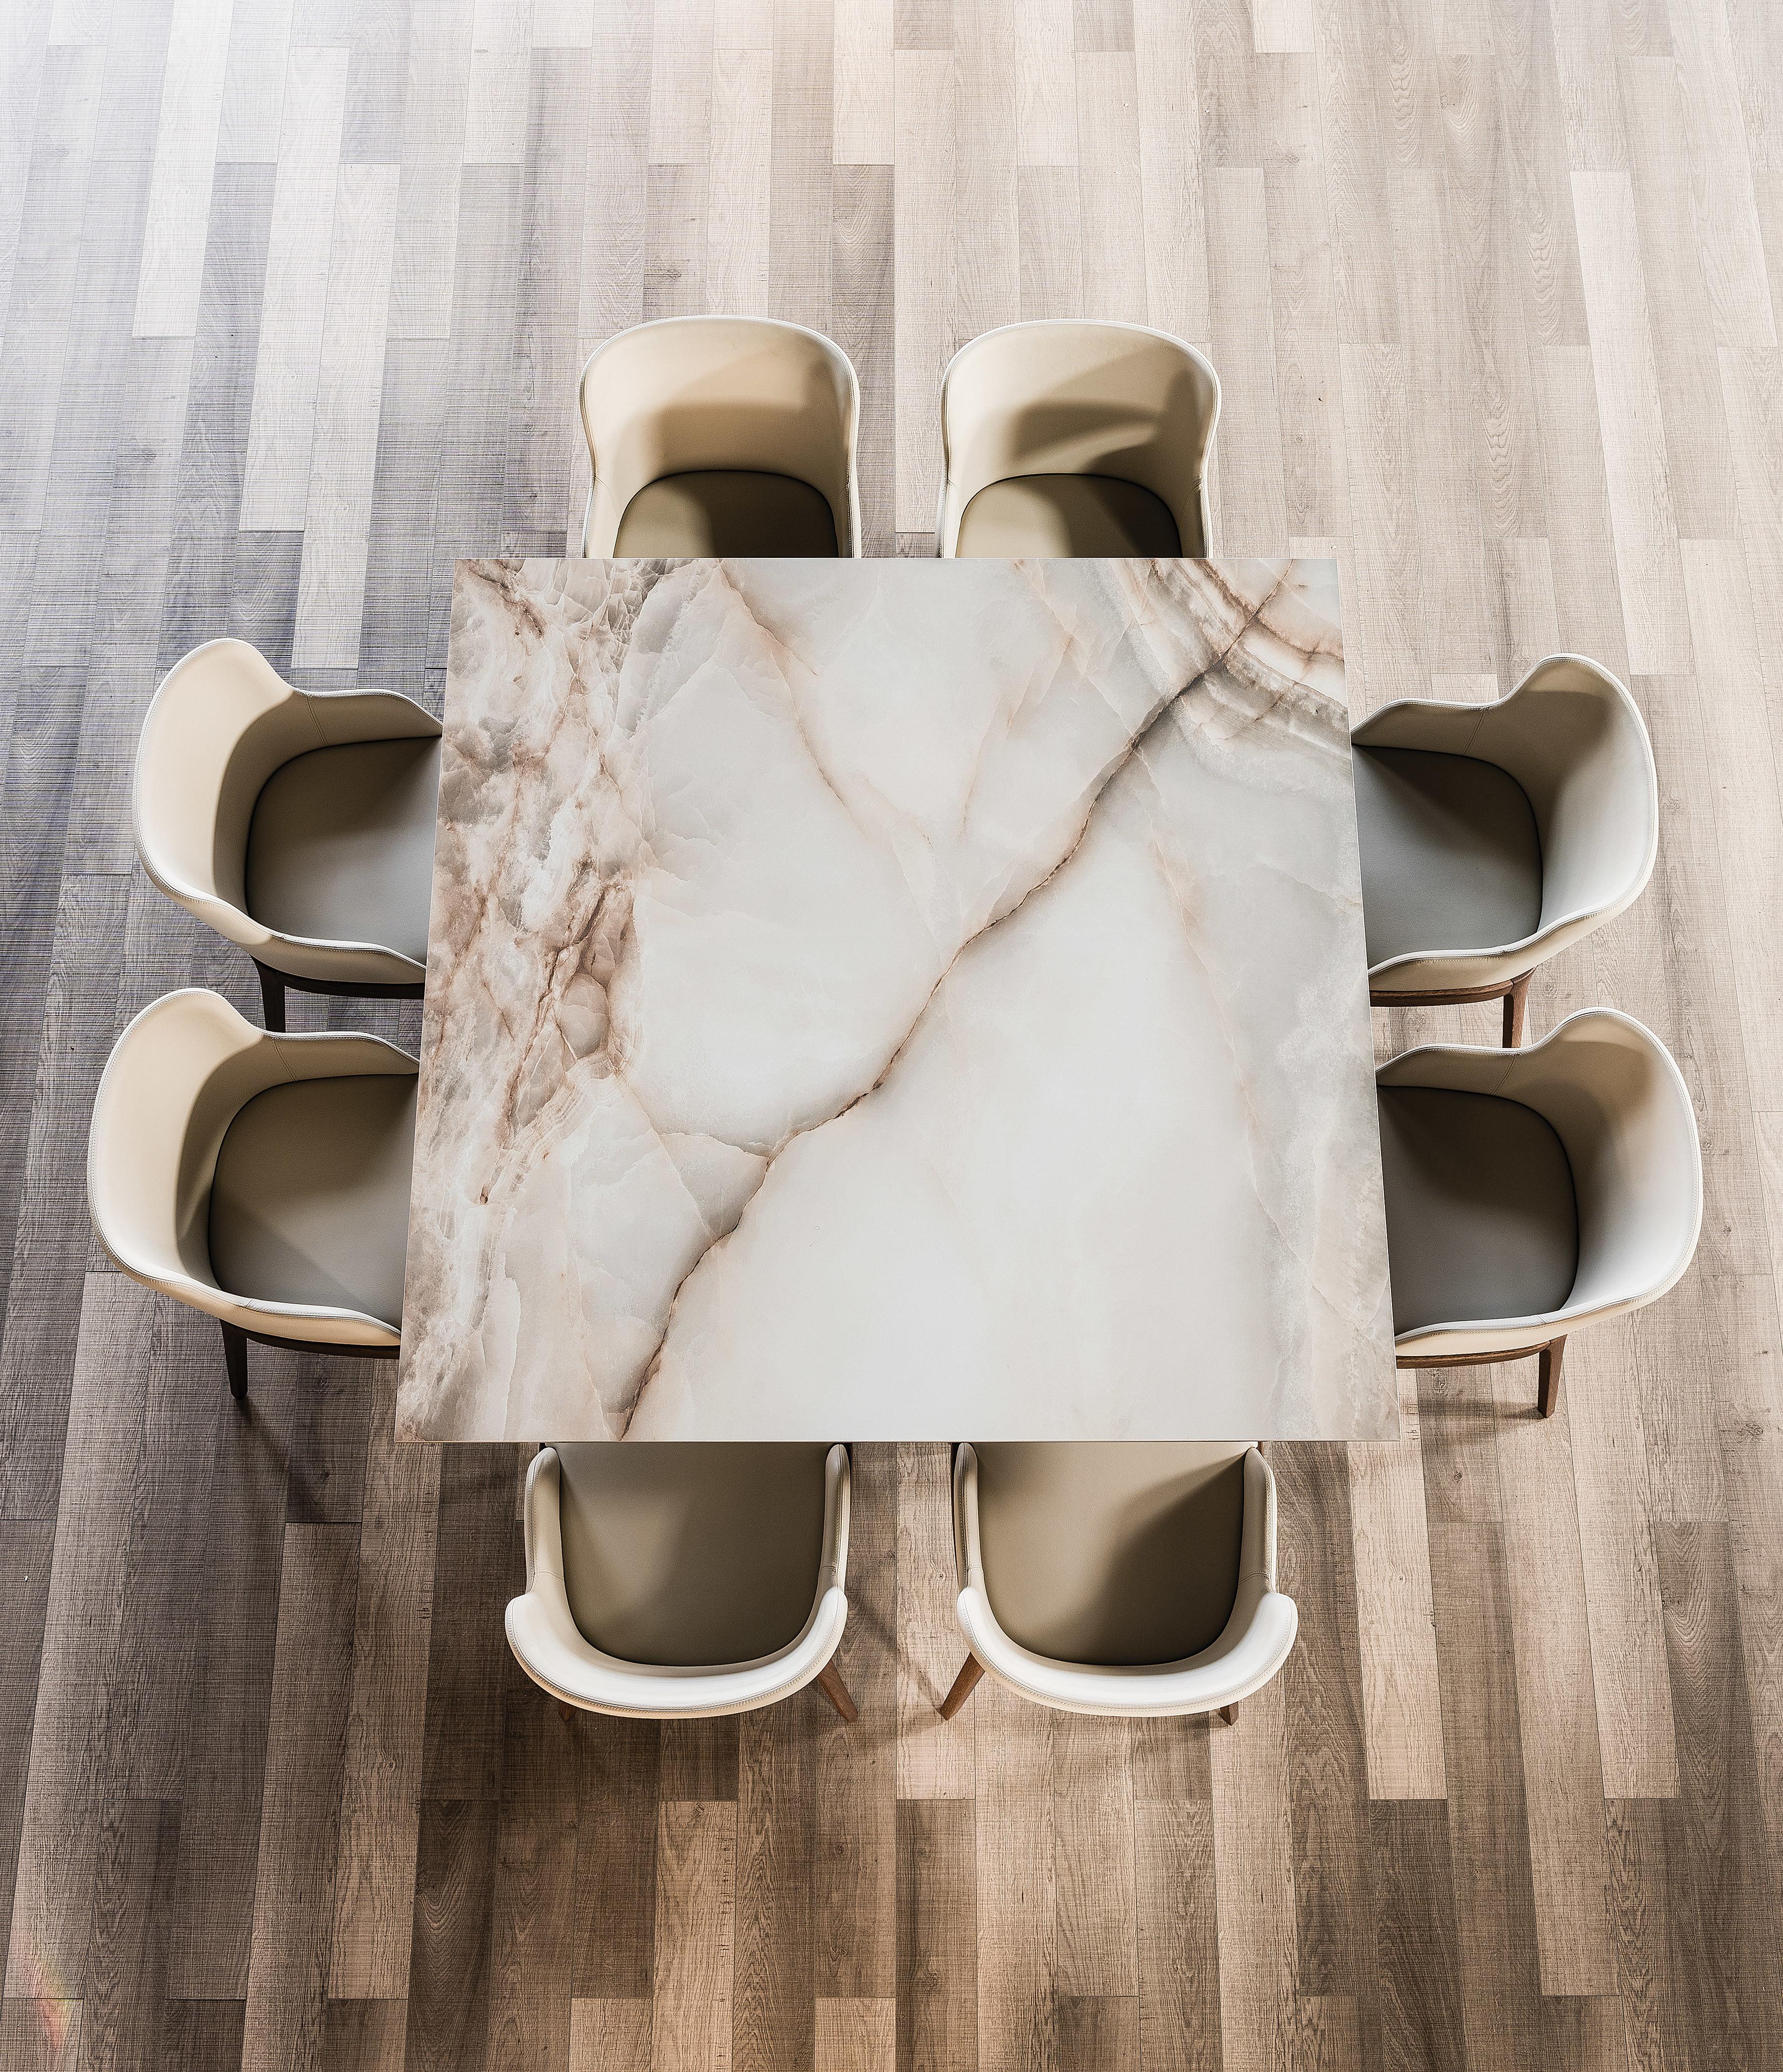 Esstisch Cattelan Gordon Keramik 05